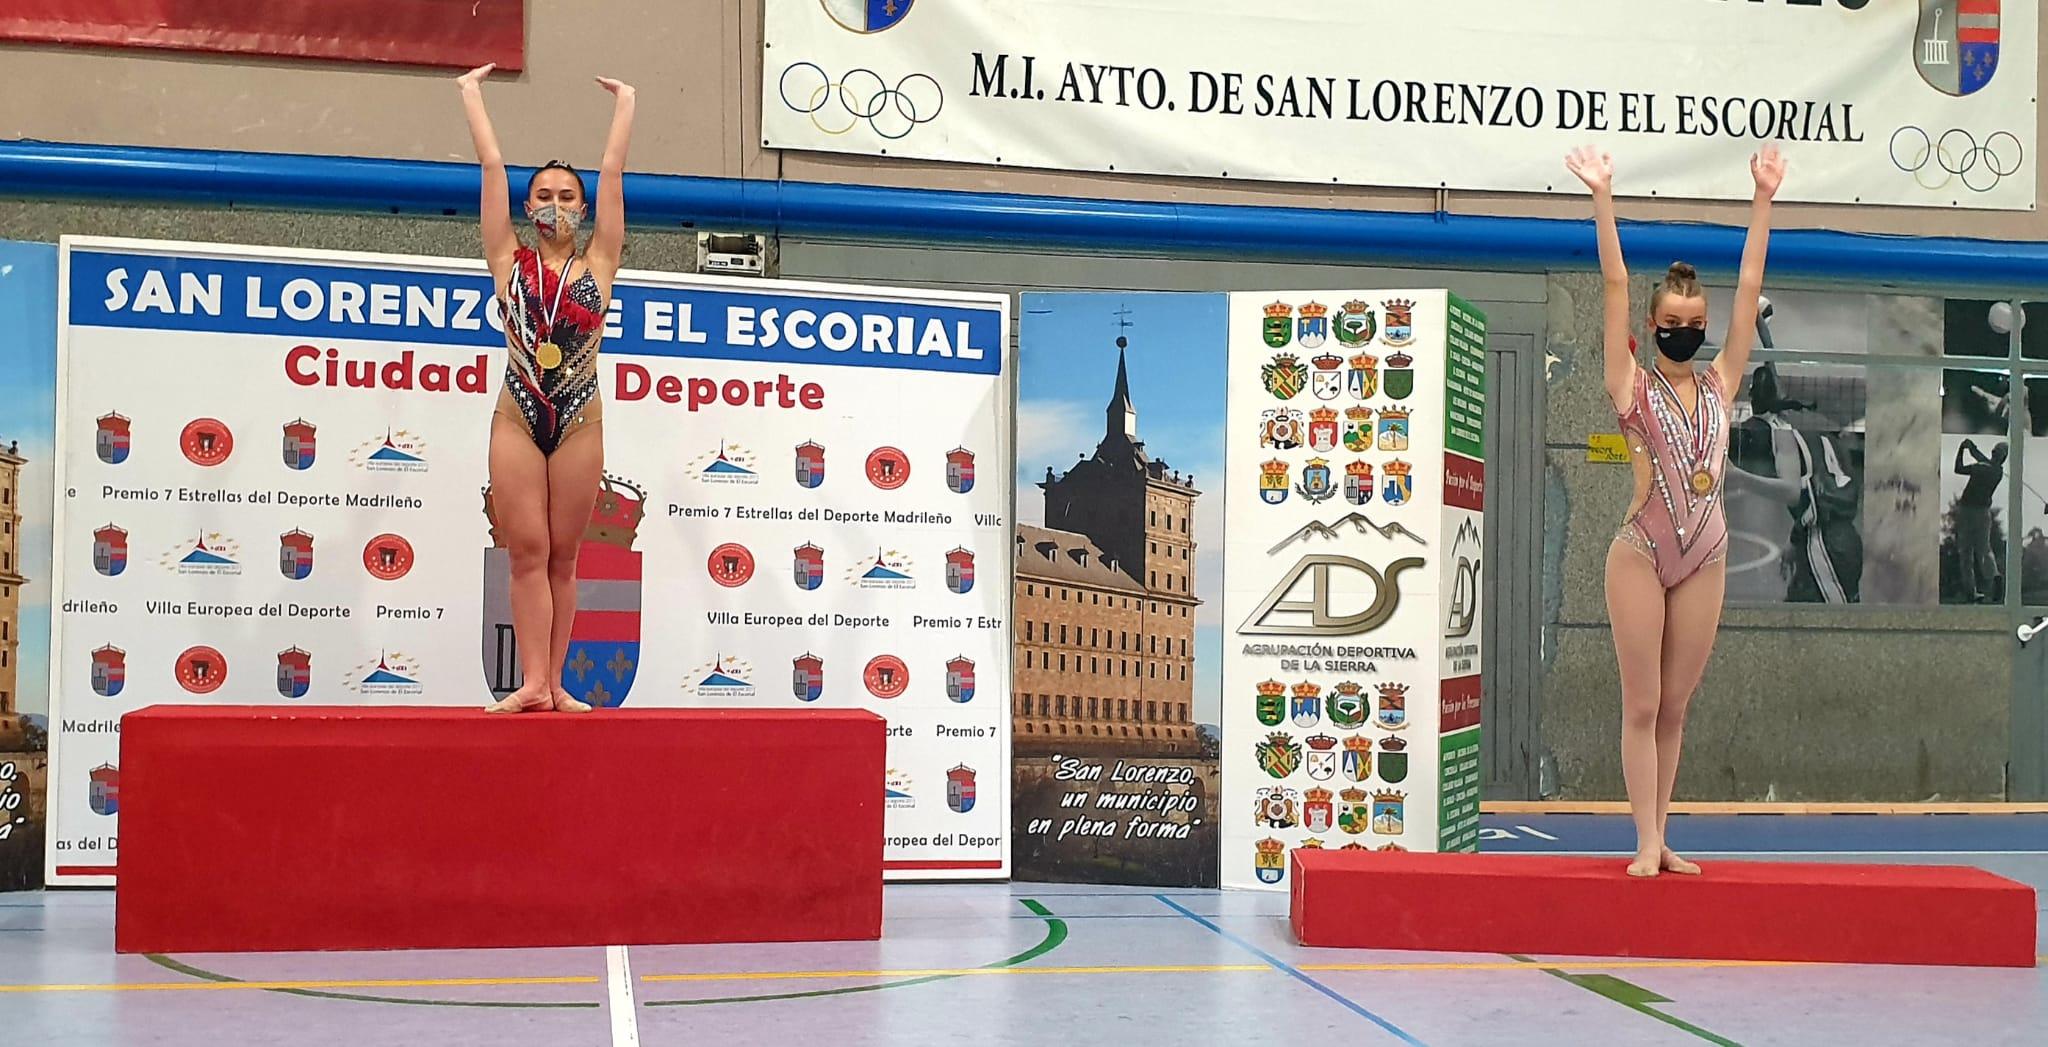 Gimnasia Rítmica de San Lorenzo de El Escorial 12